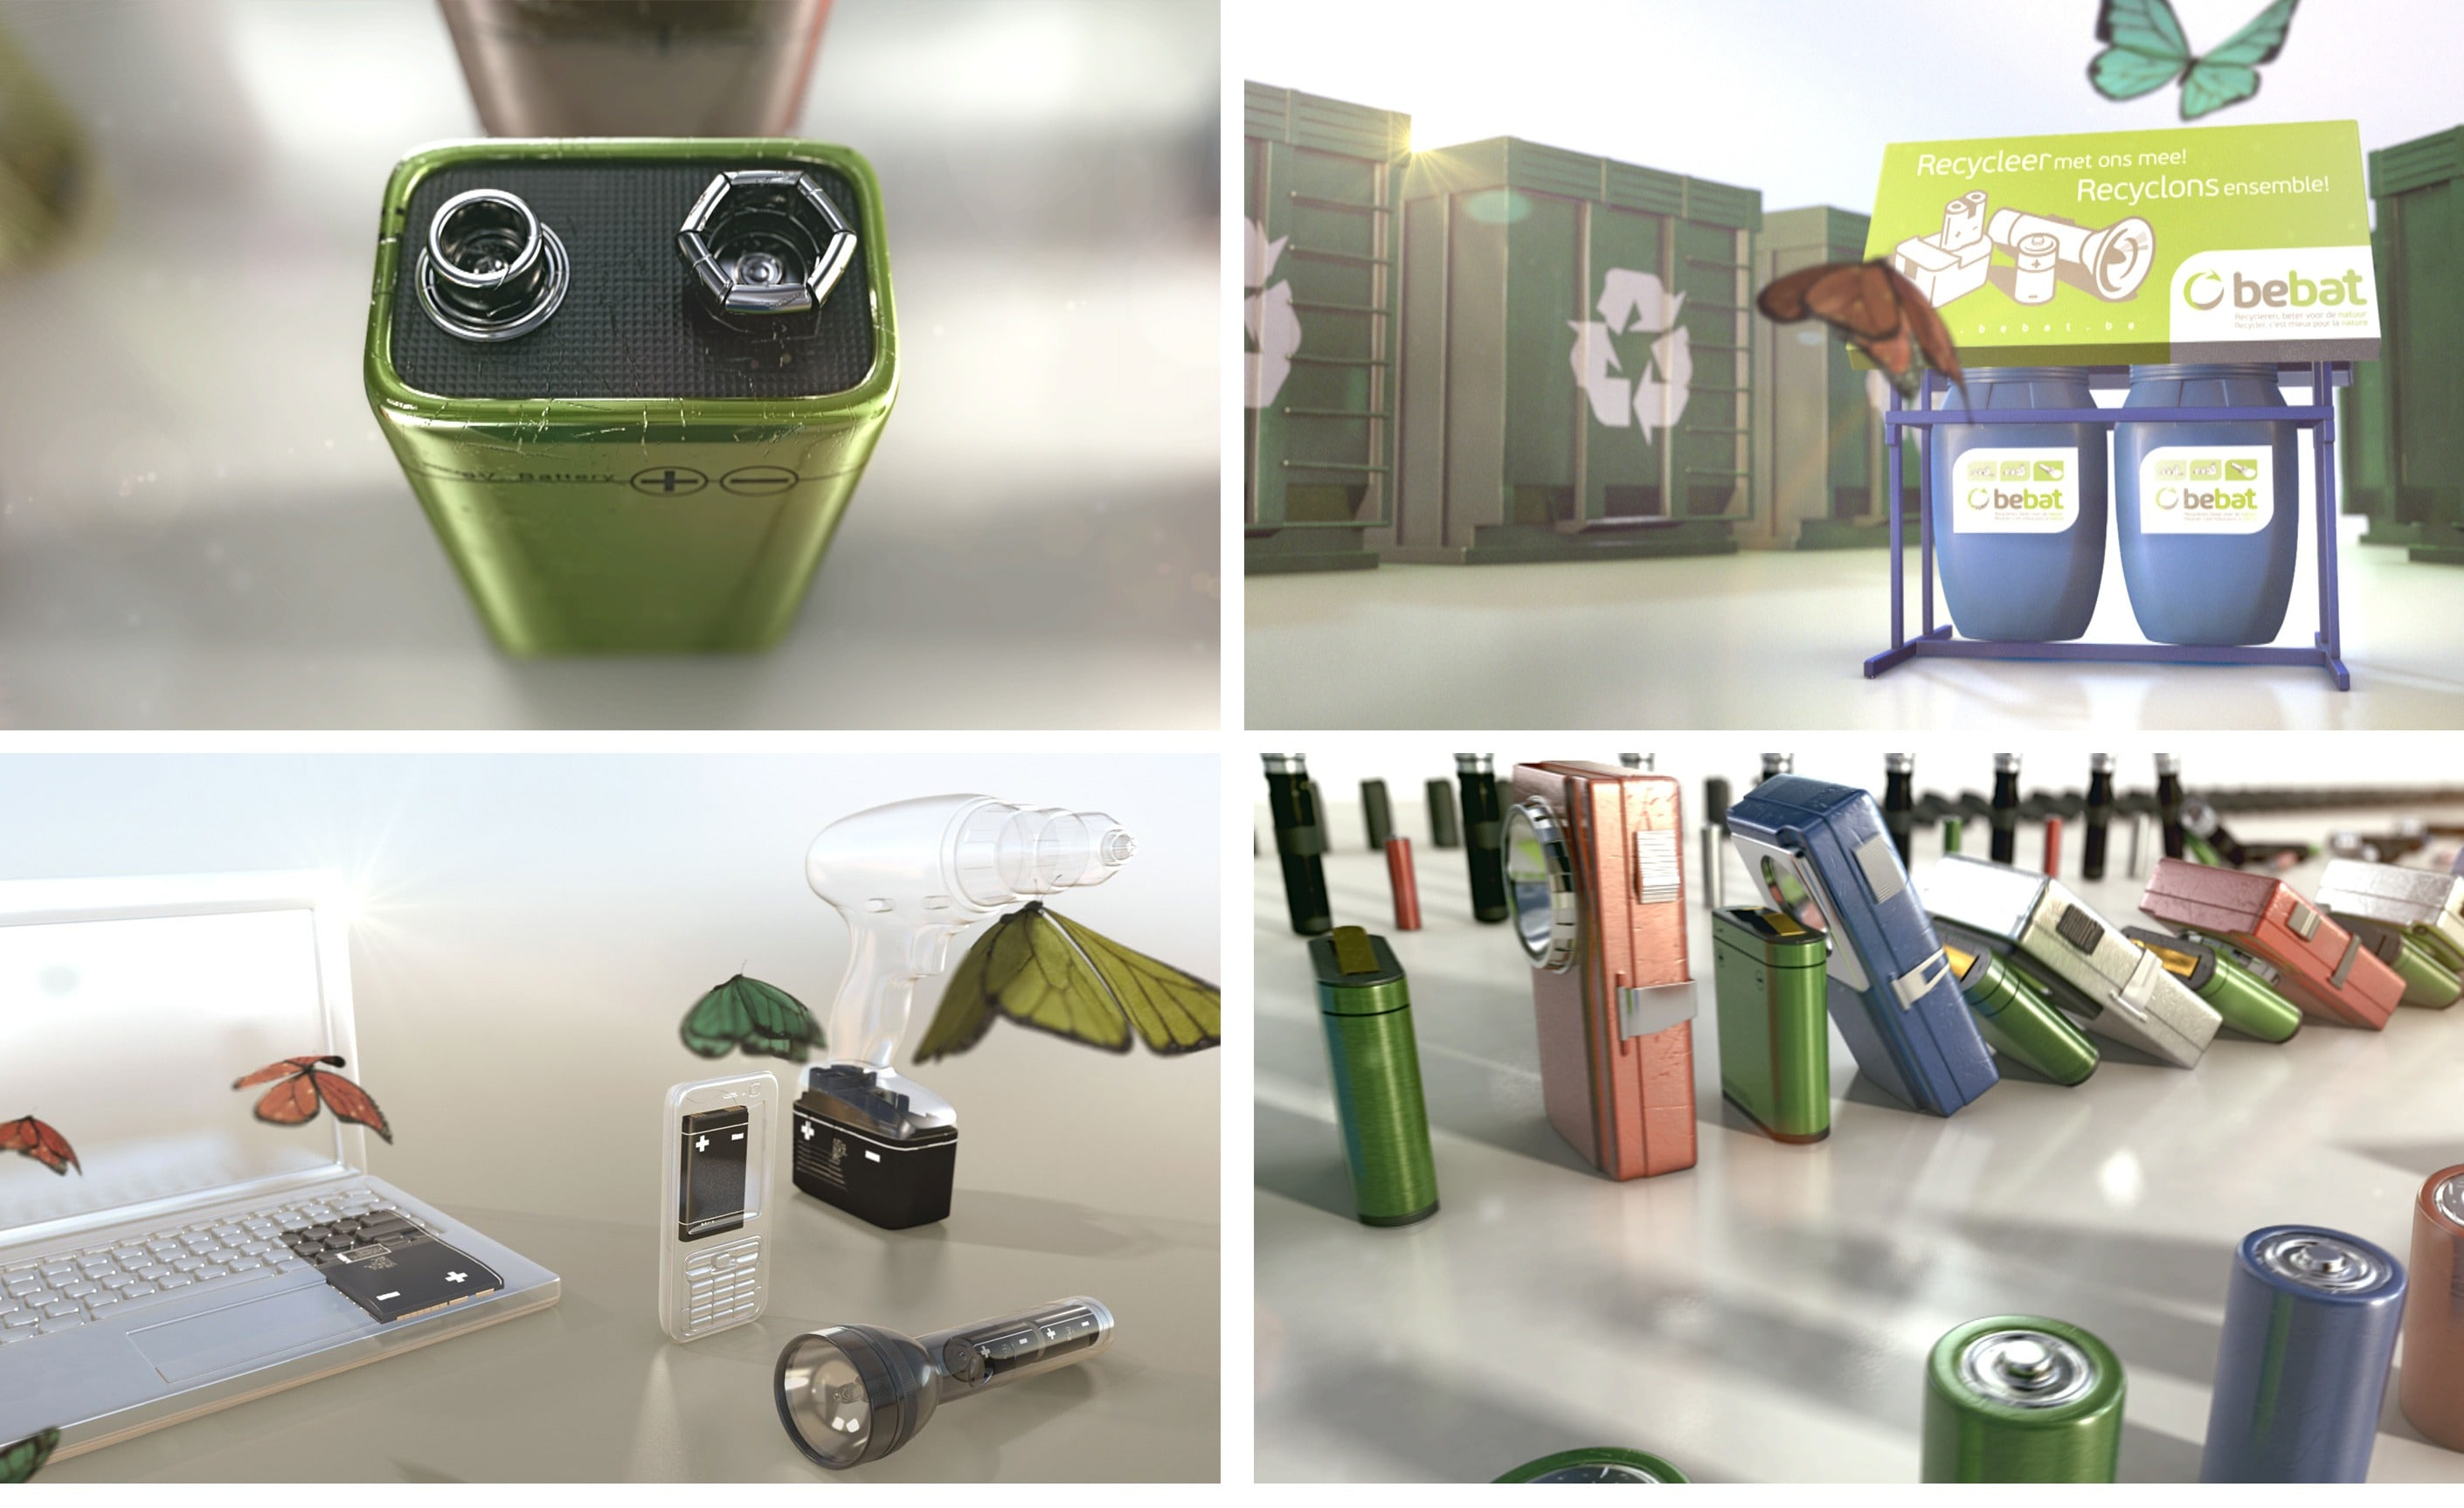 stas3dart-bebat-promotional-video-recycling